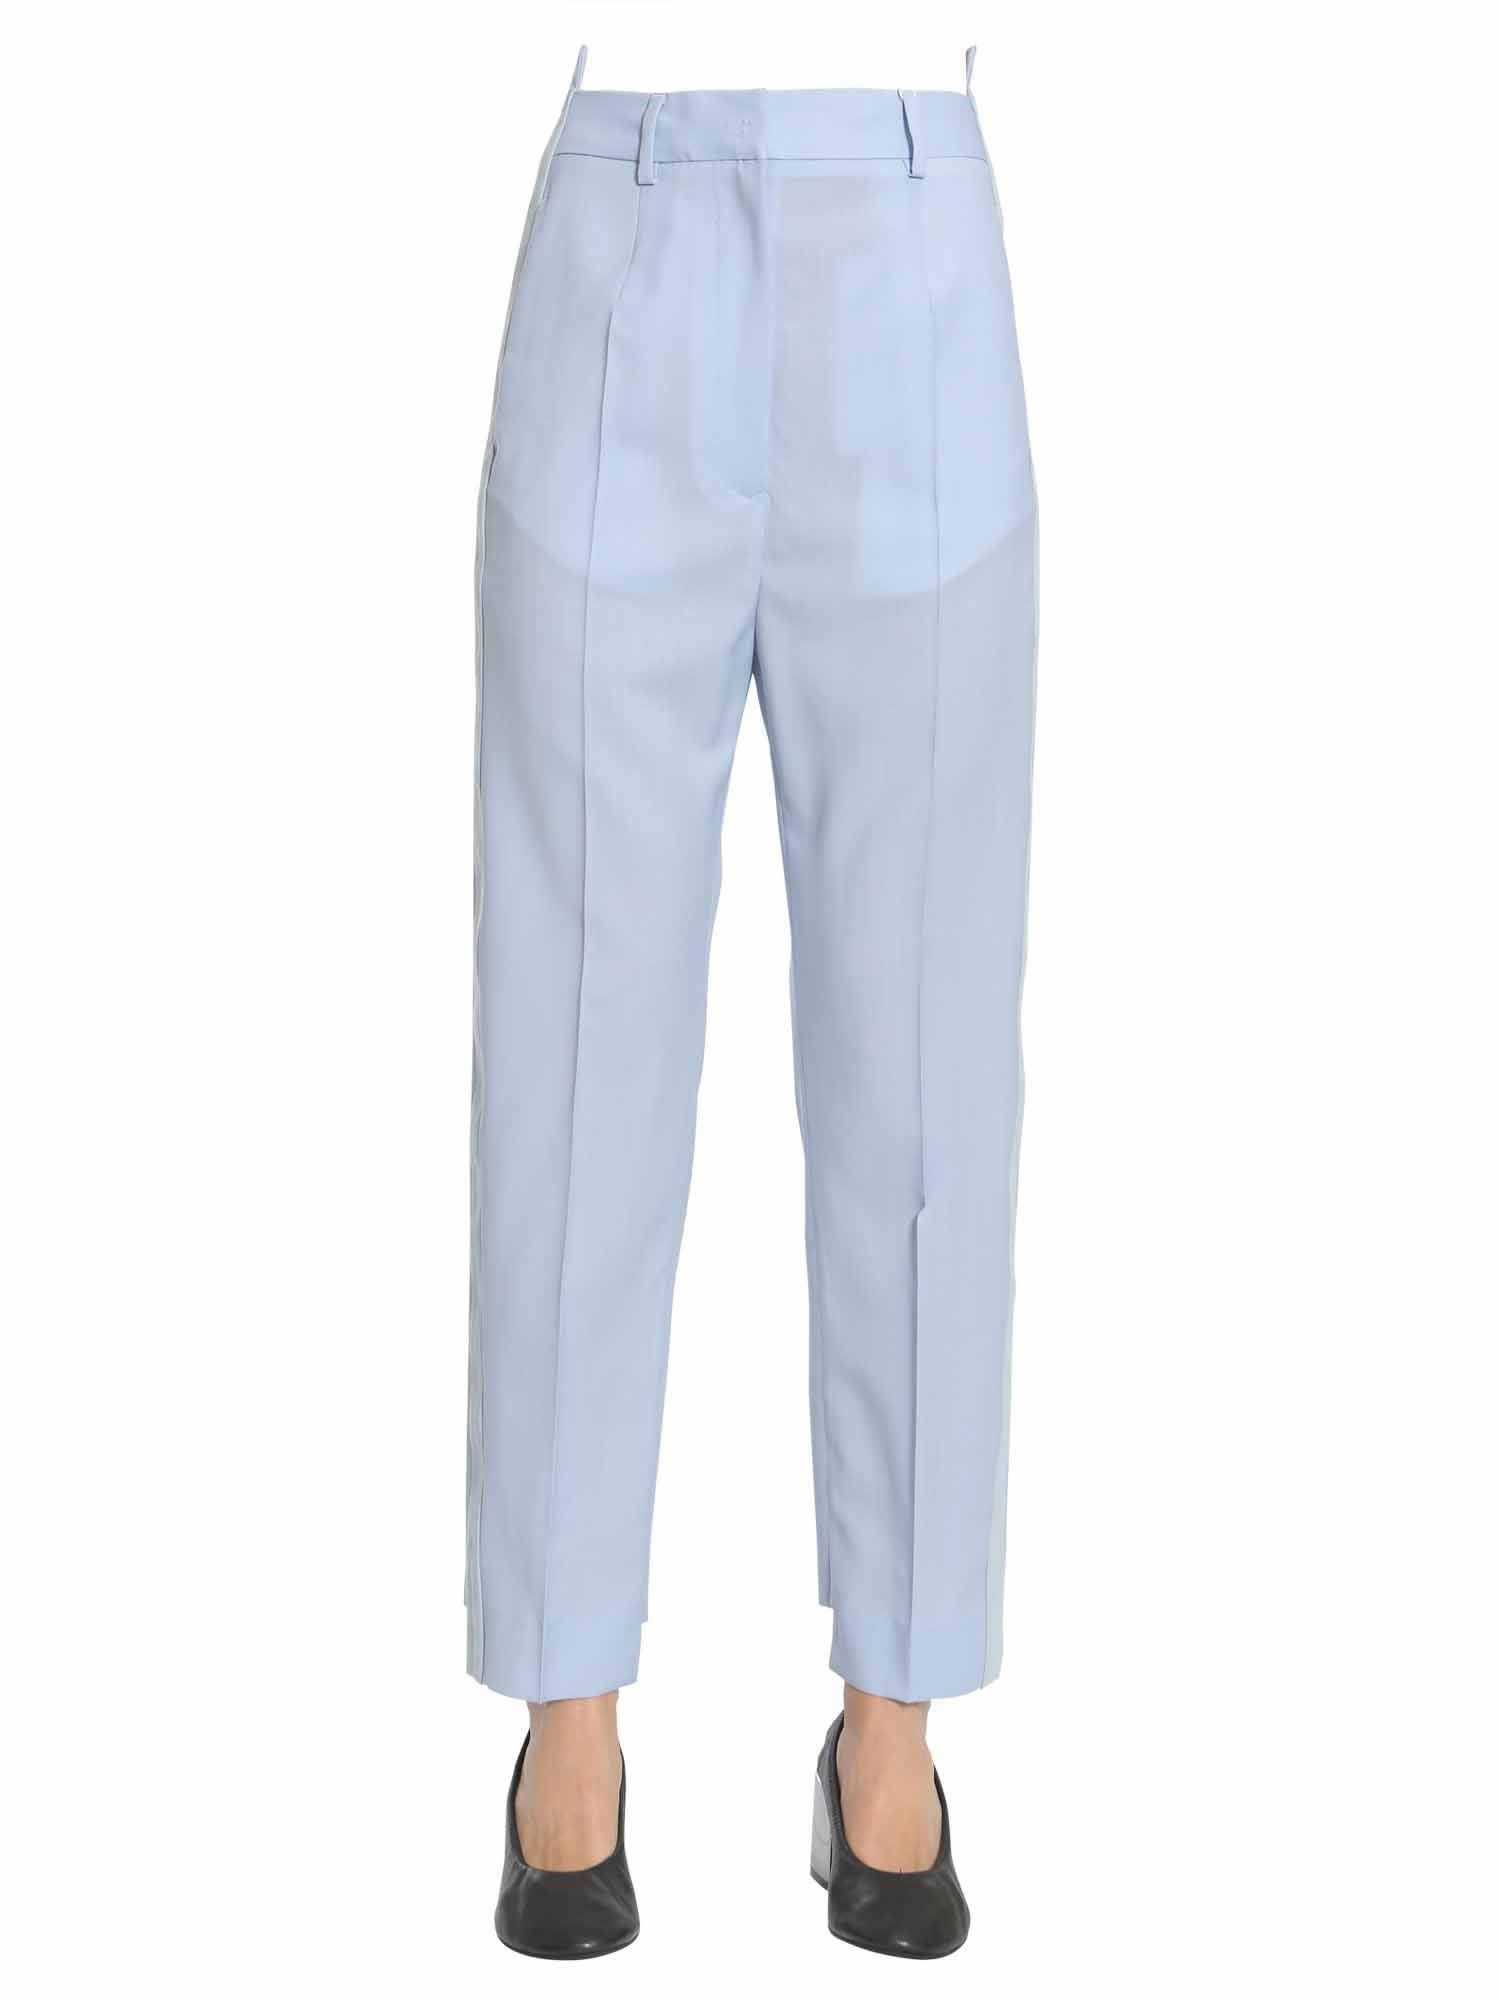 MM6 Maison Margiela Classic Trousers